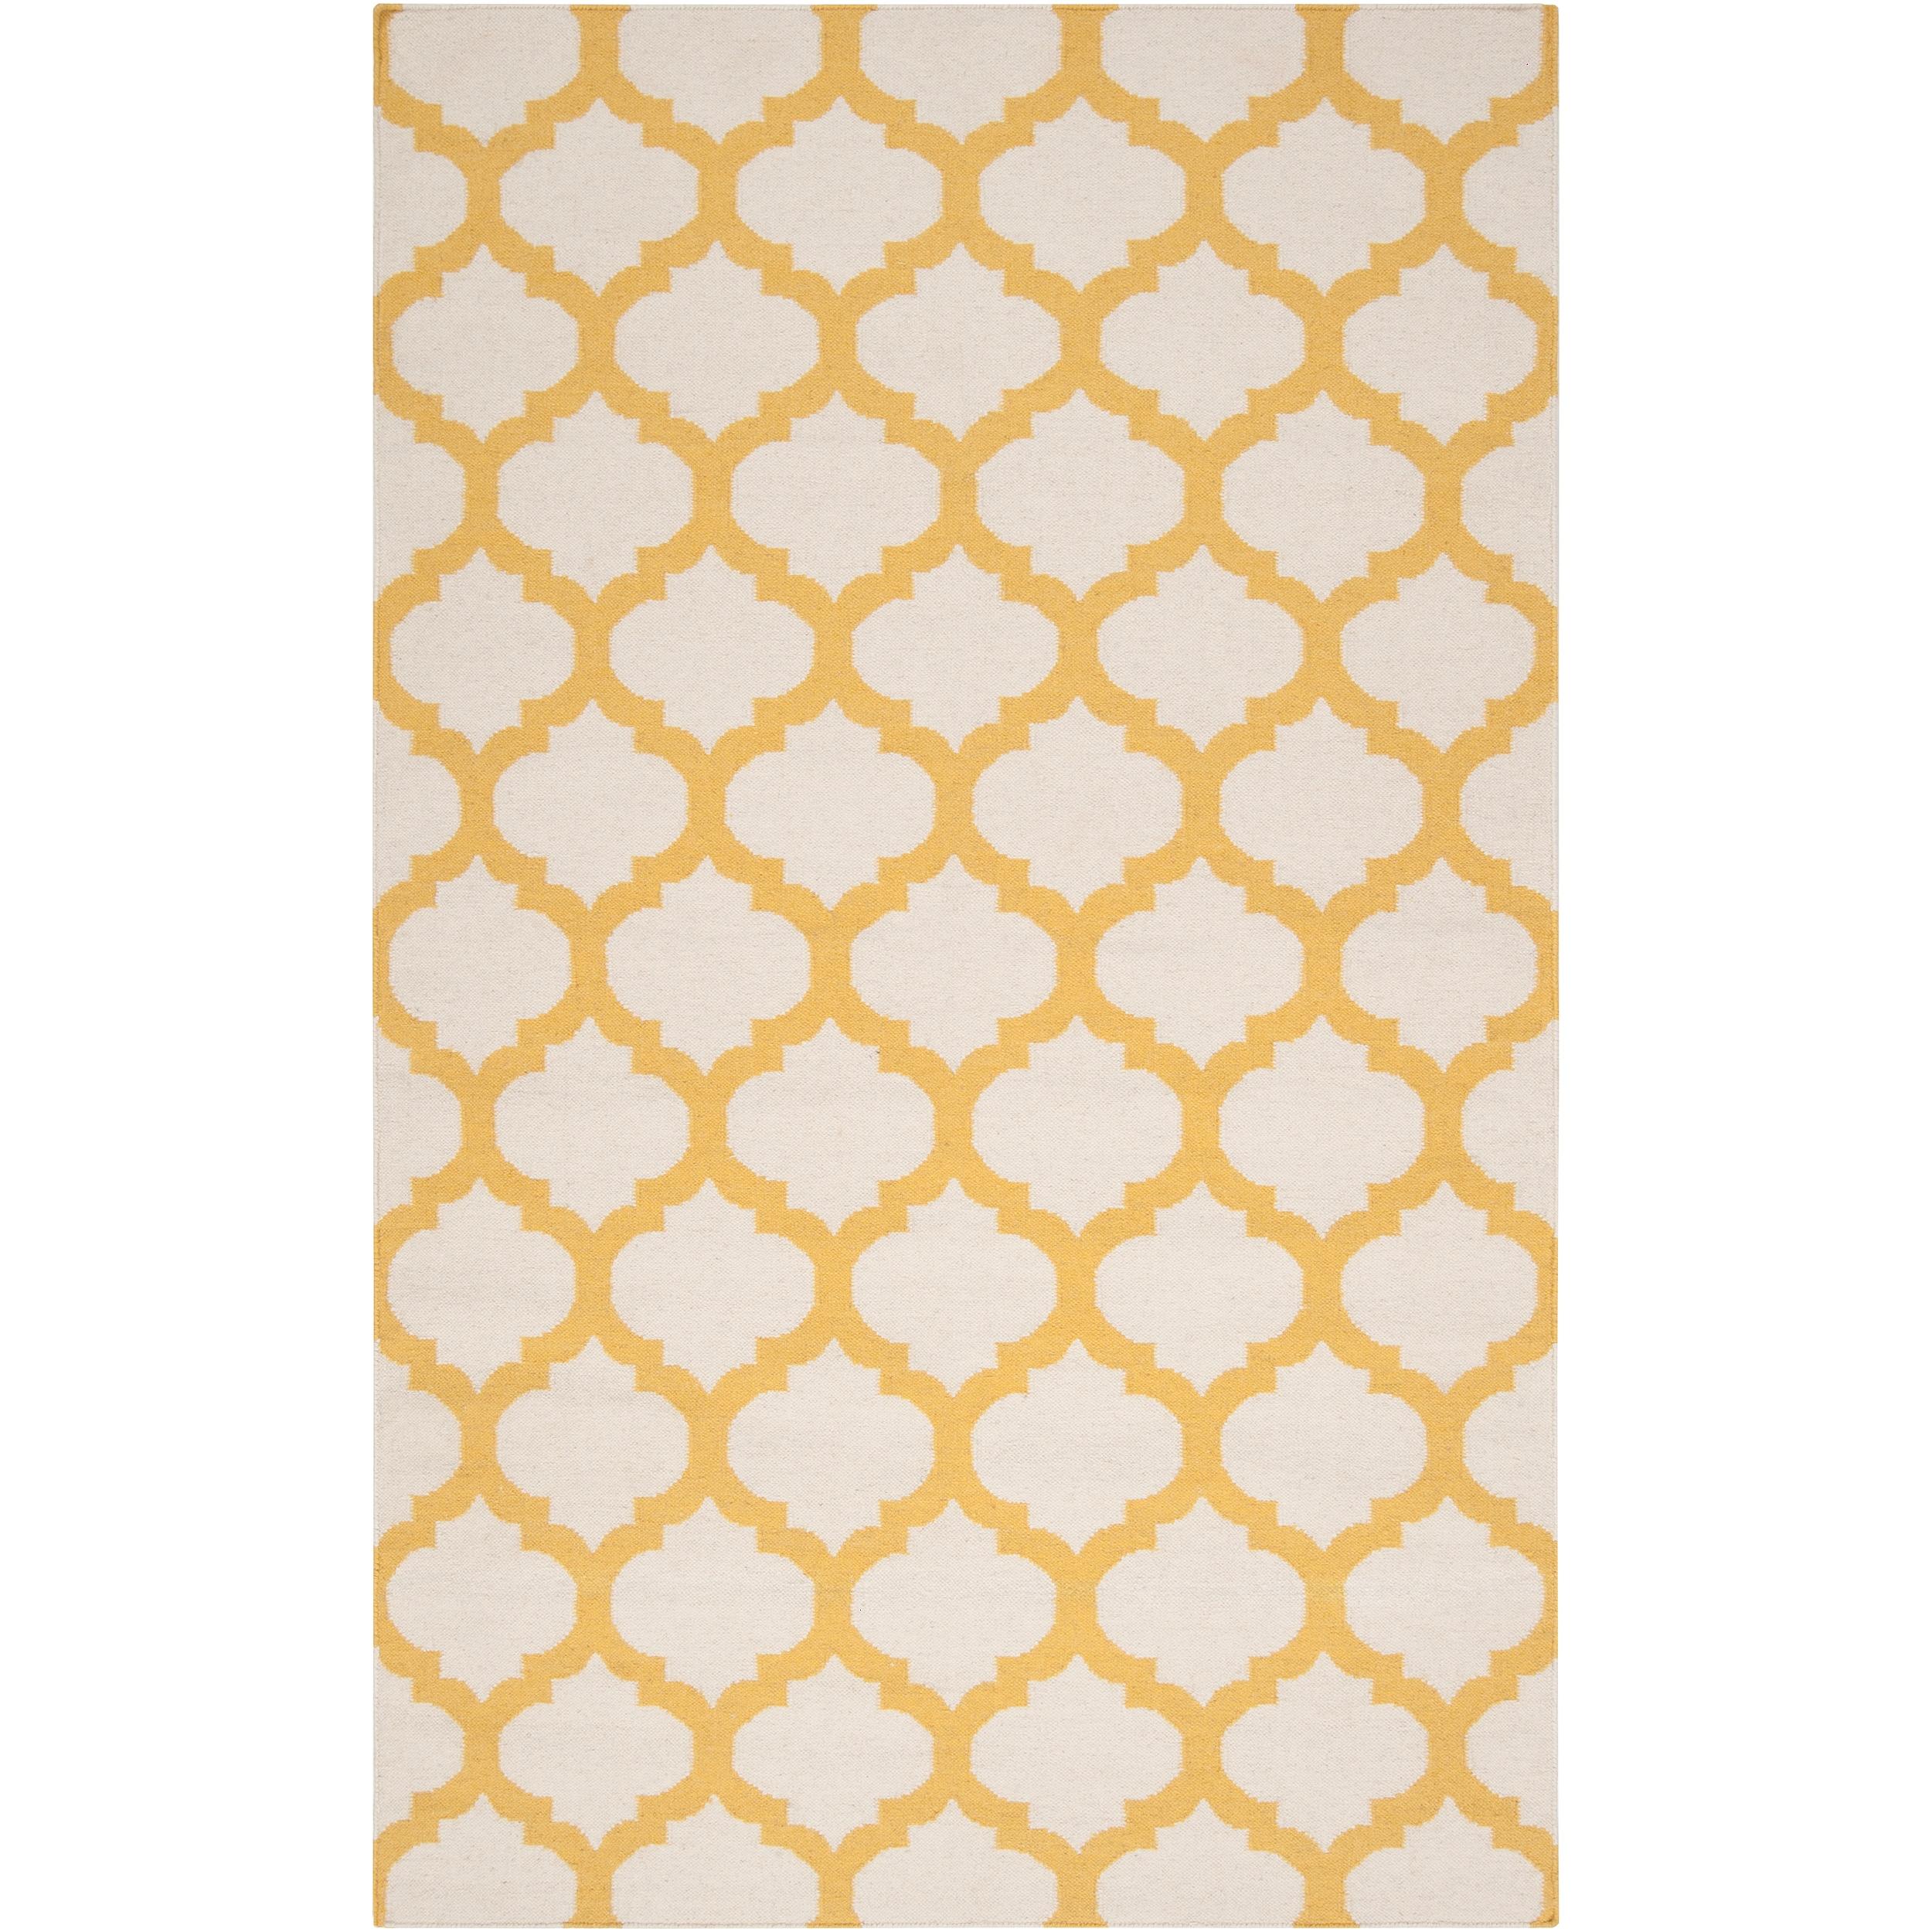 Hand-woven Yellow Caroni Wool Area Rug (8' x 11')